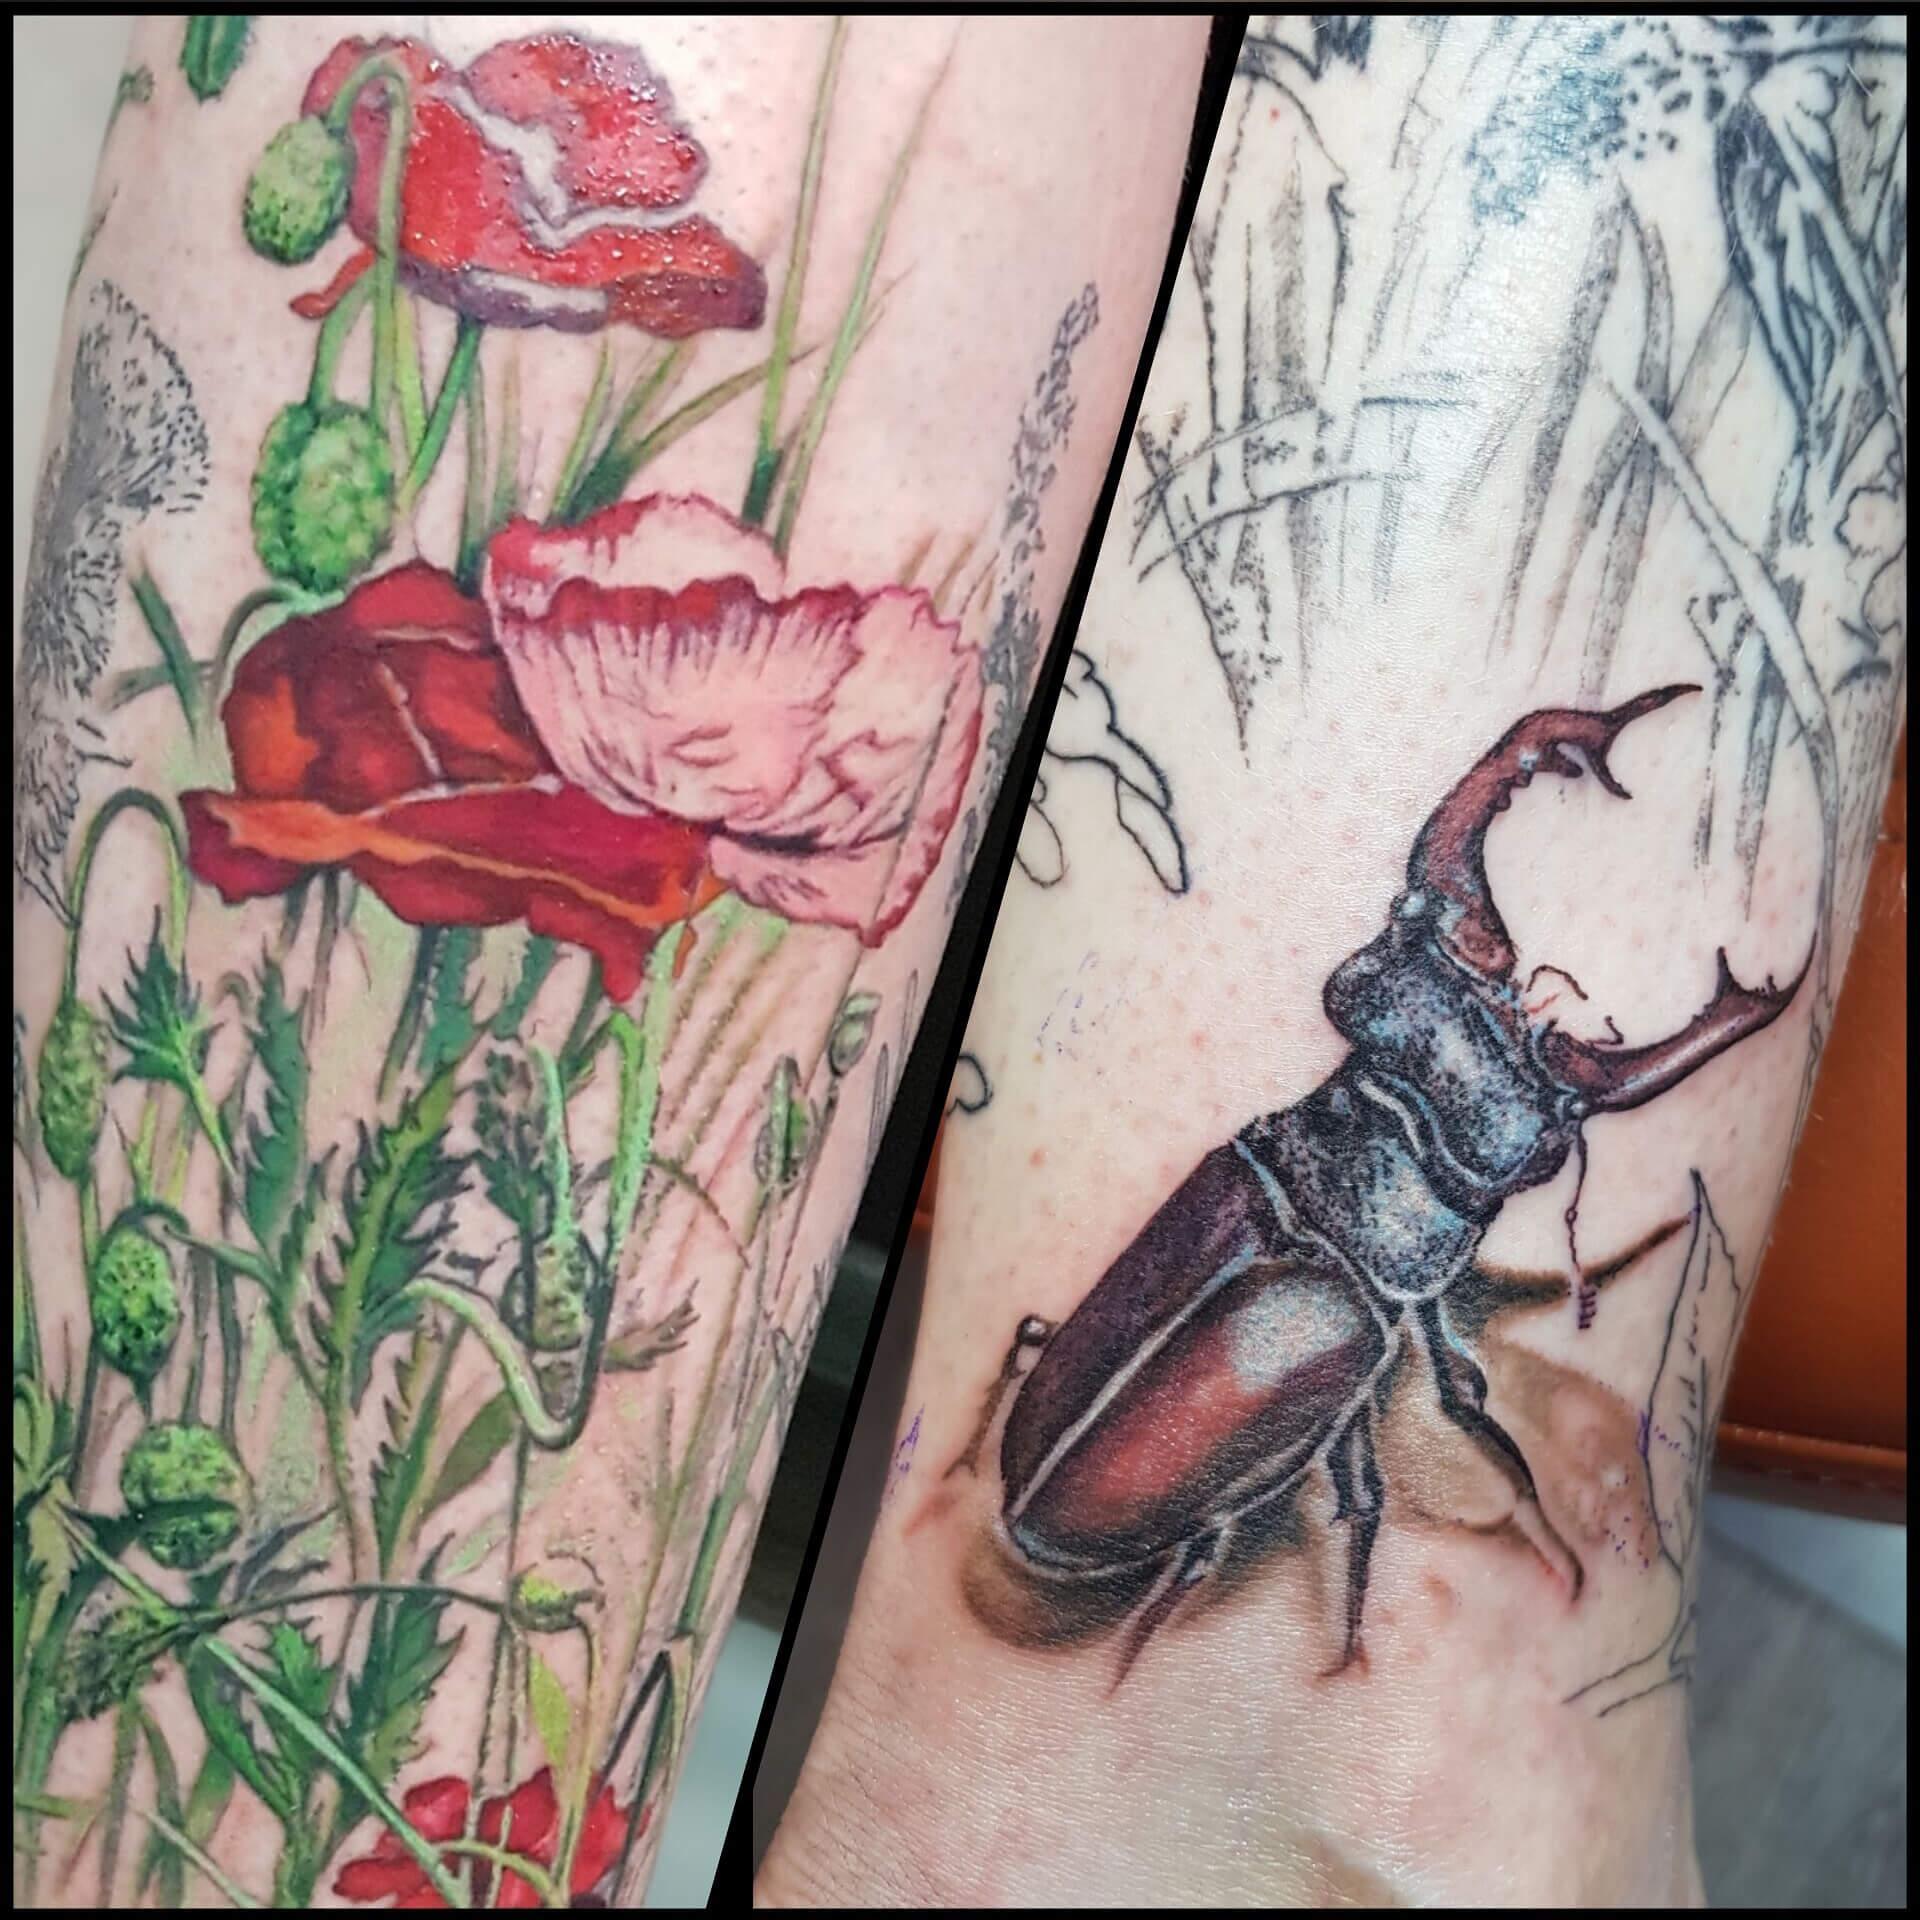 Studio tatuażu Gdańsk Alicja Mazur_flora i fauna